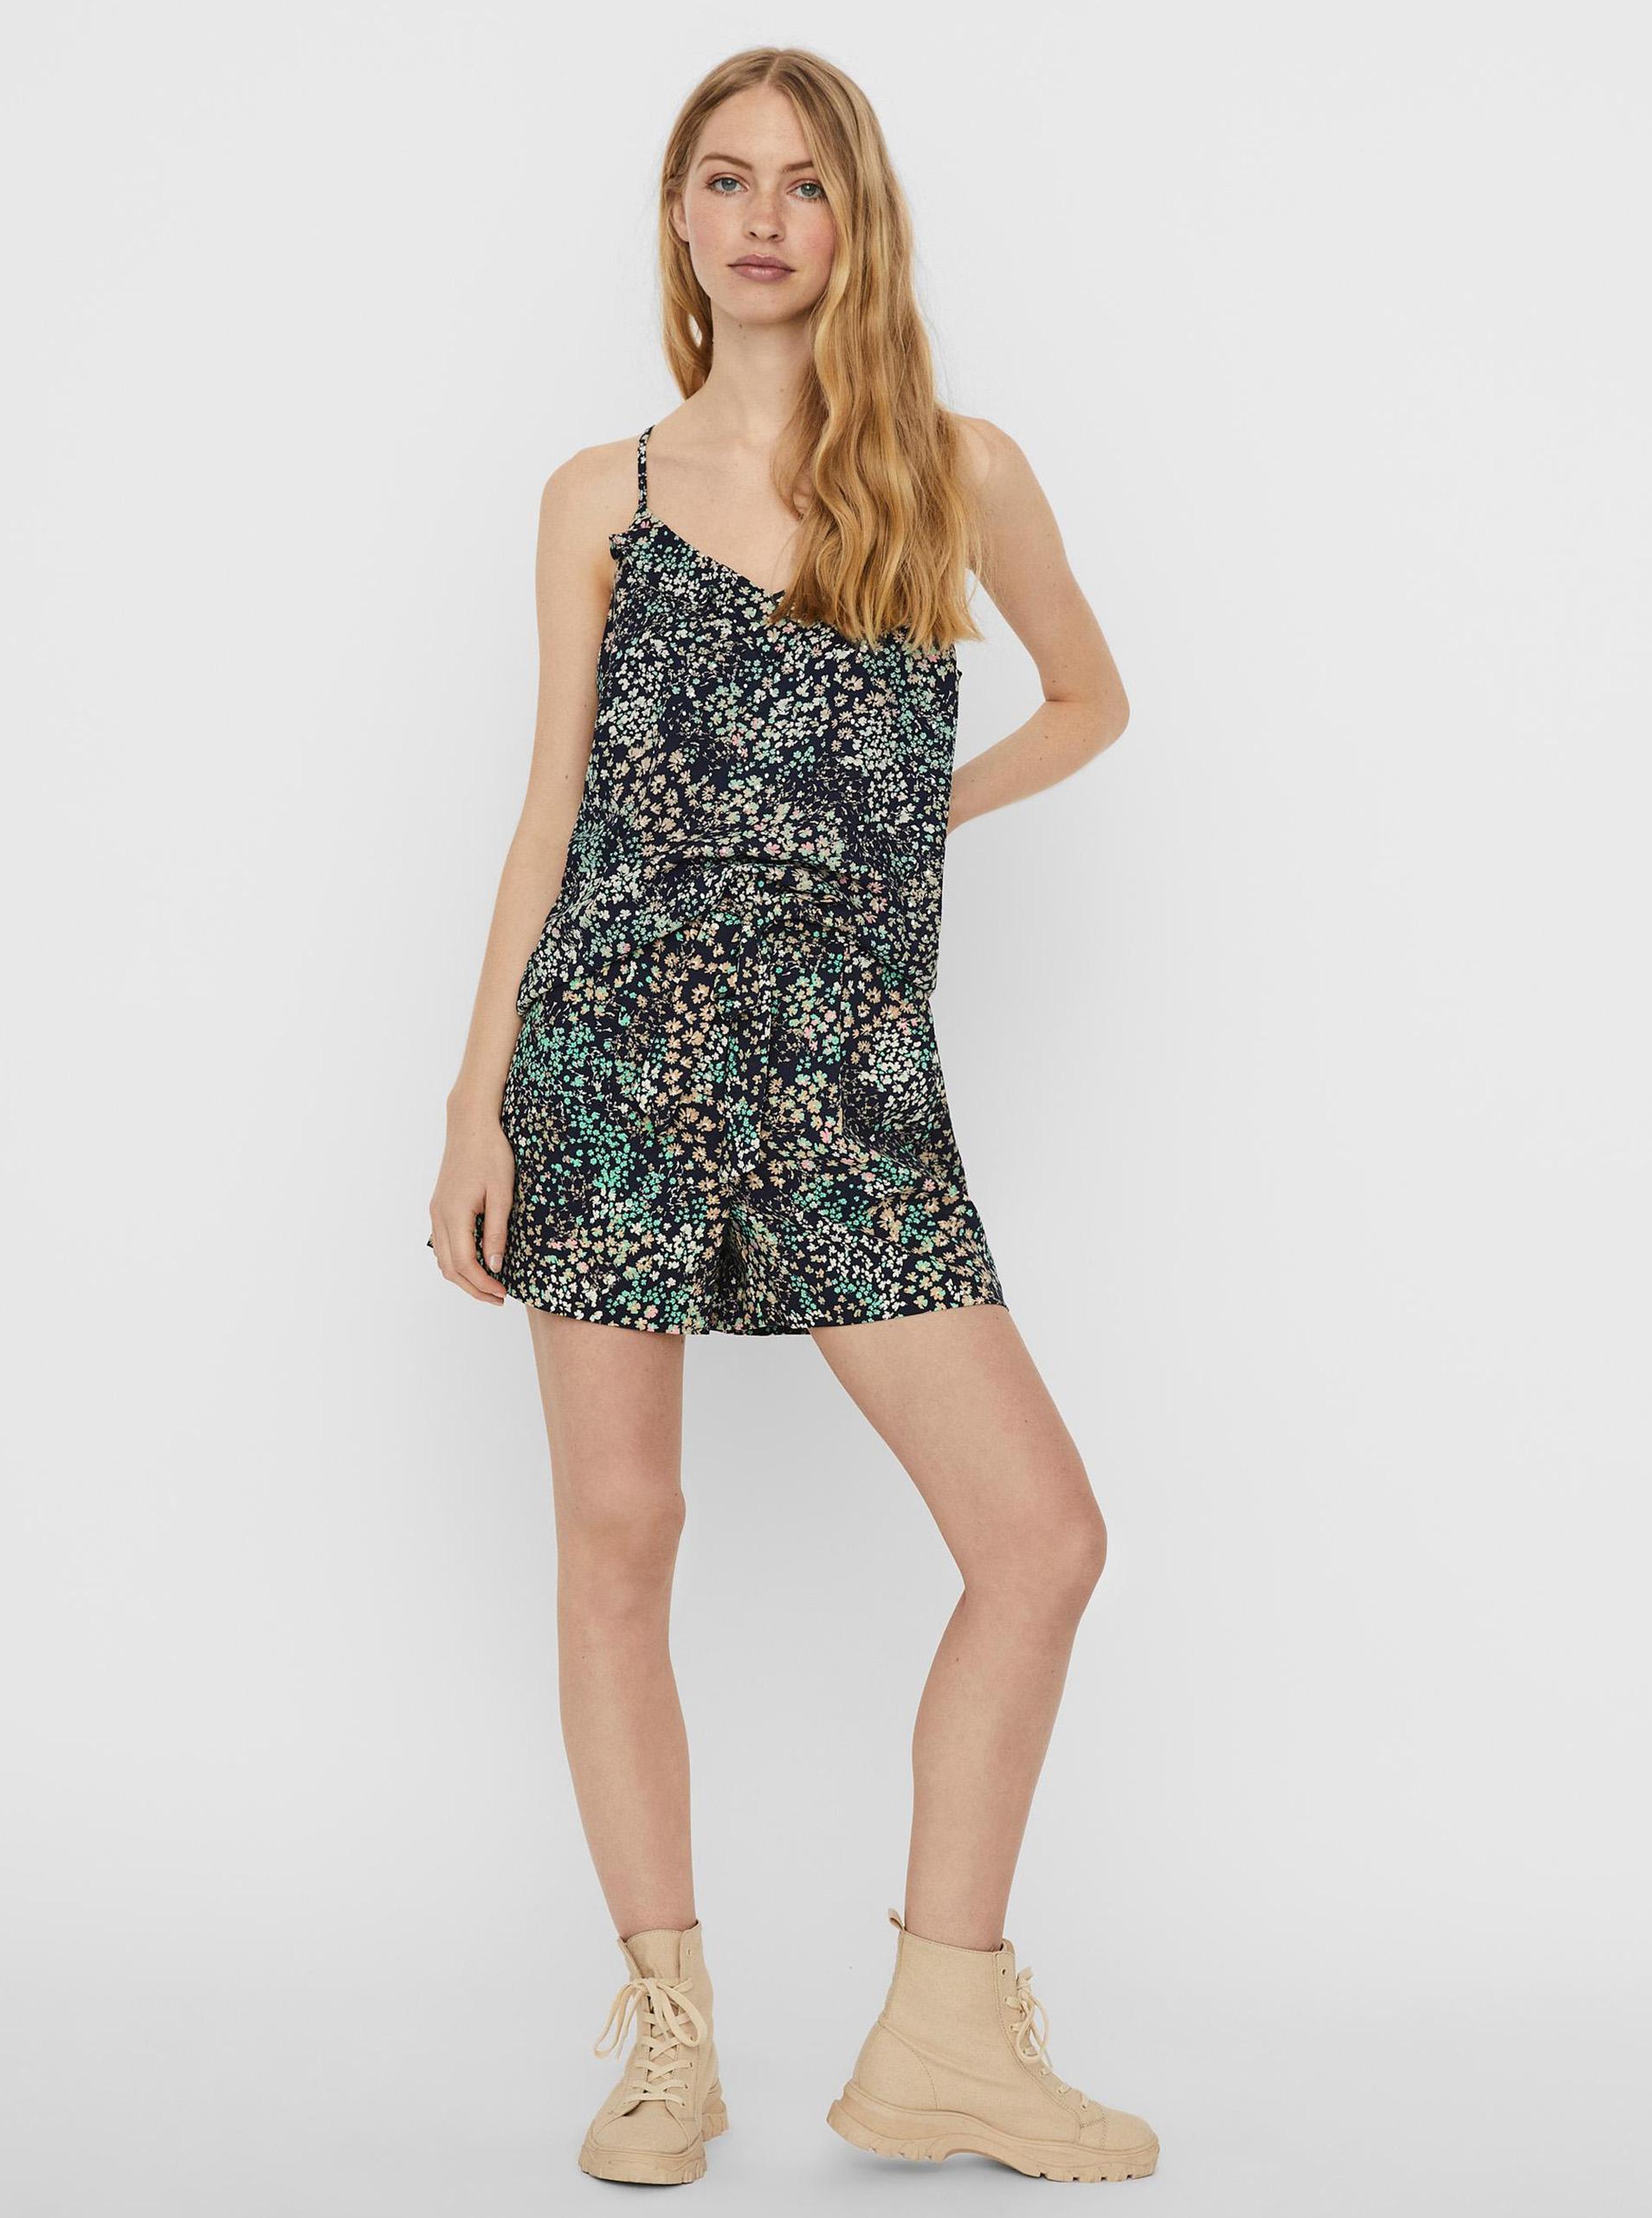 Vero Moda modrý top Hannah s květinovým motivem